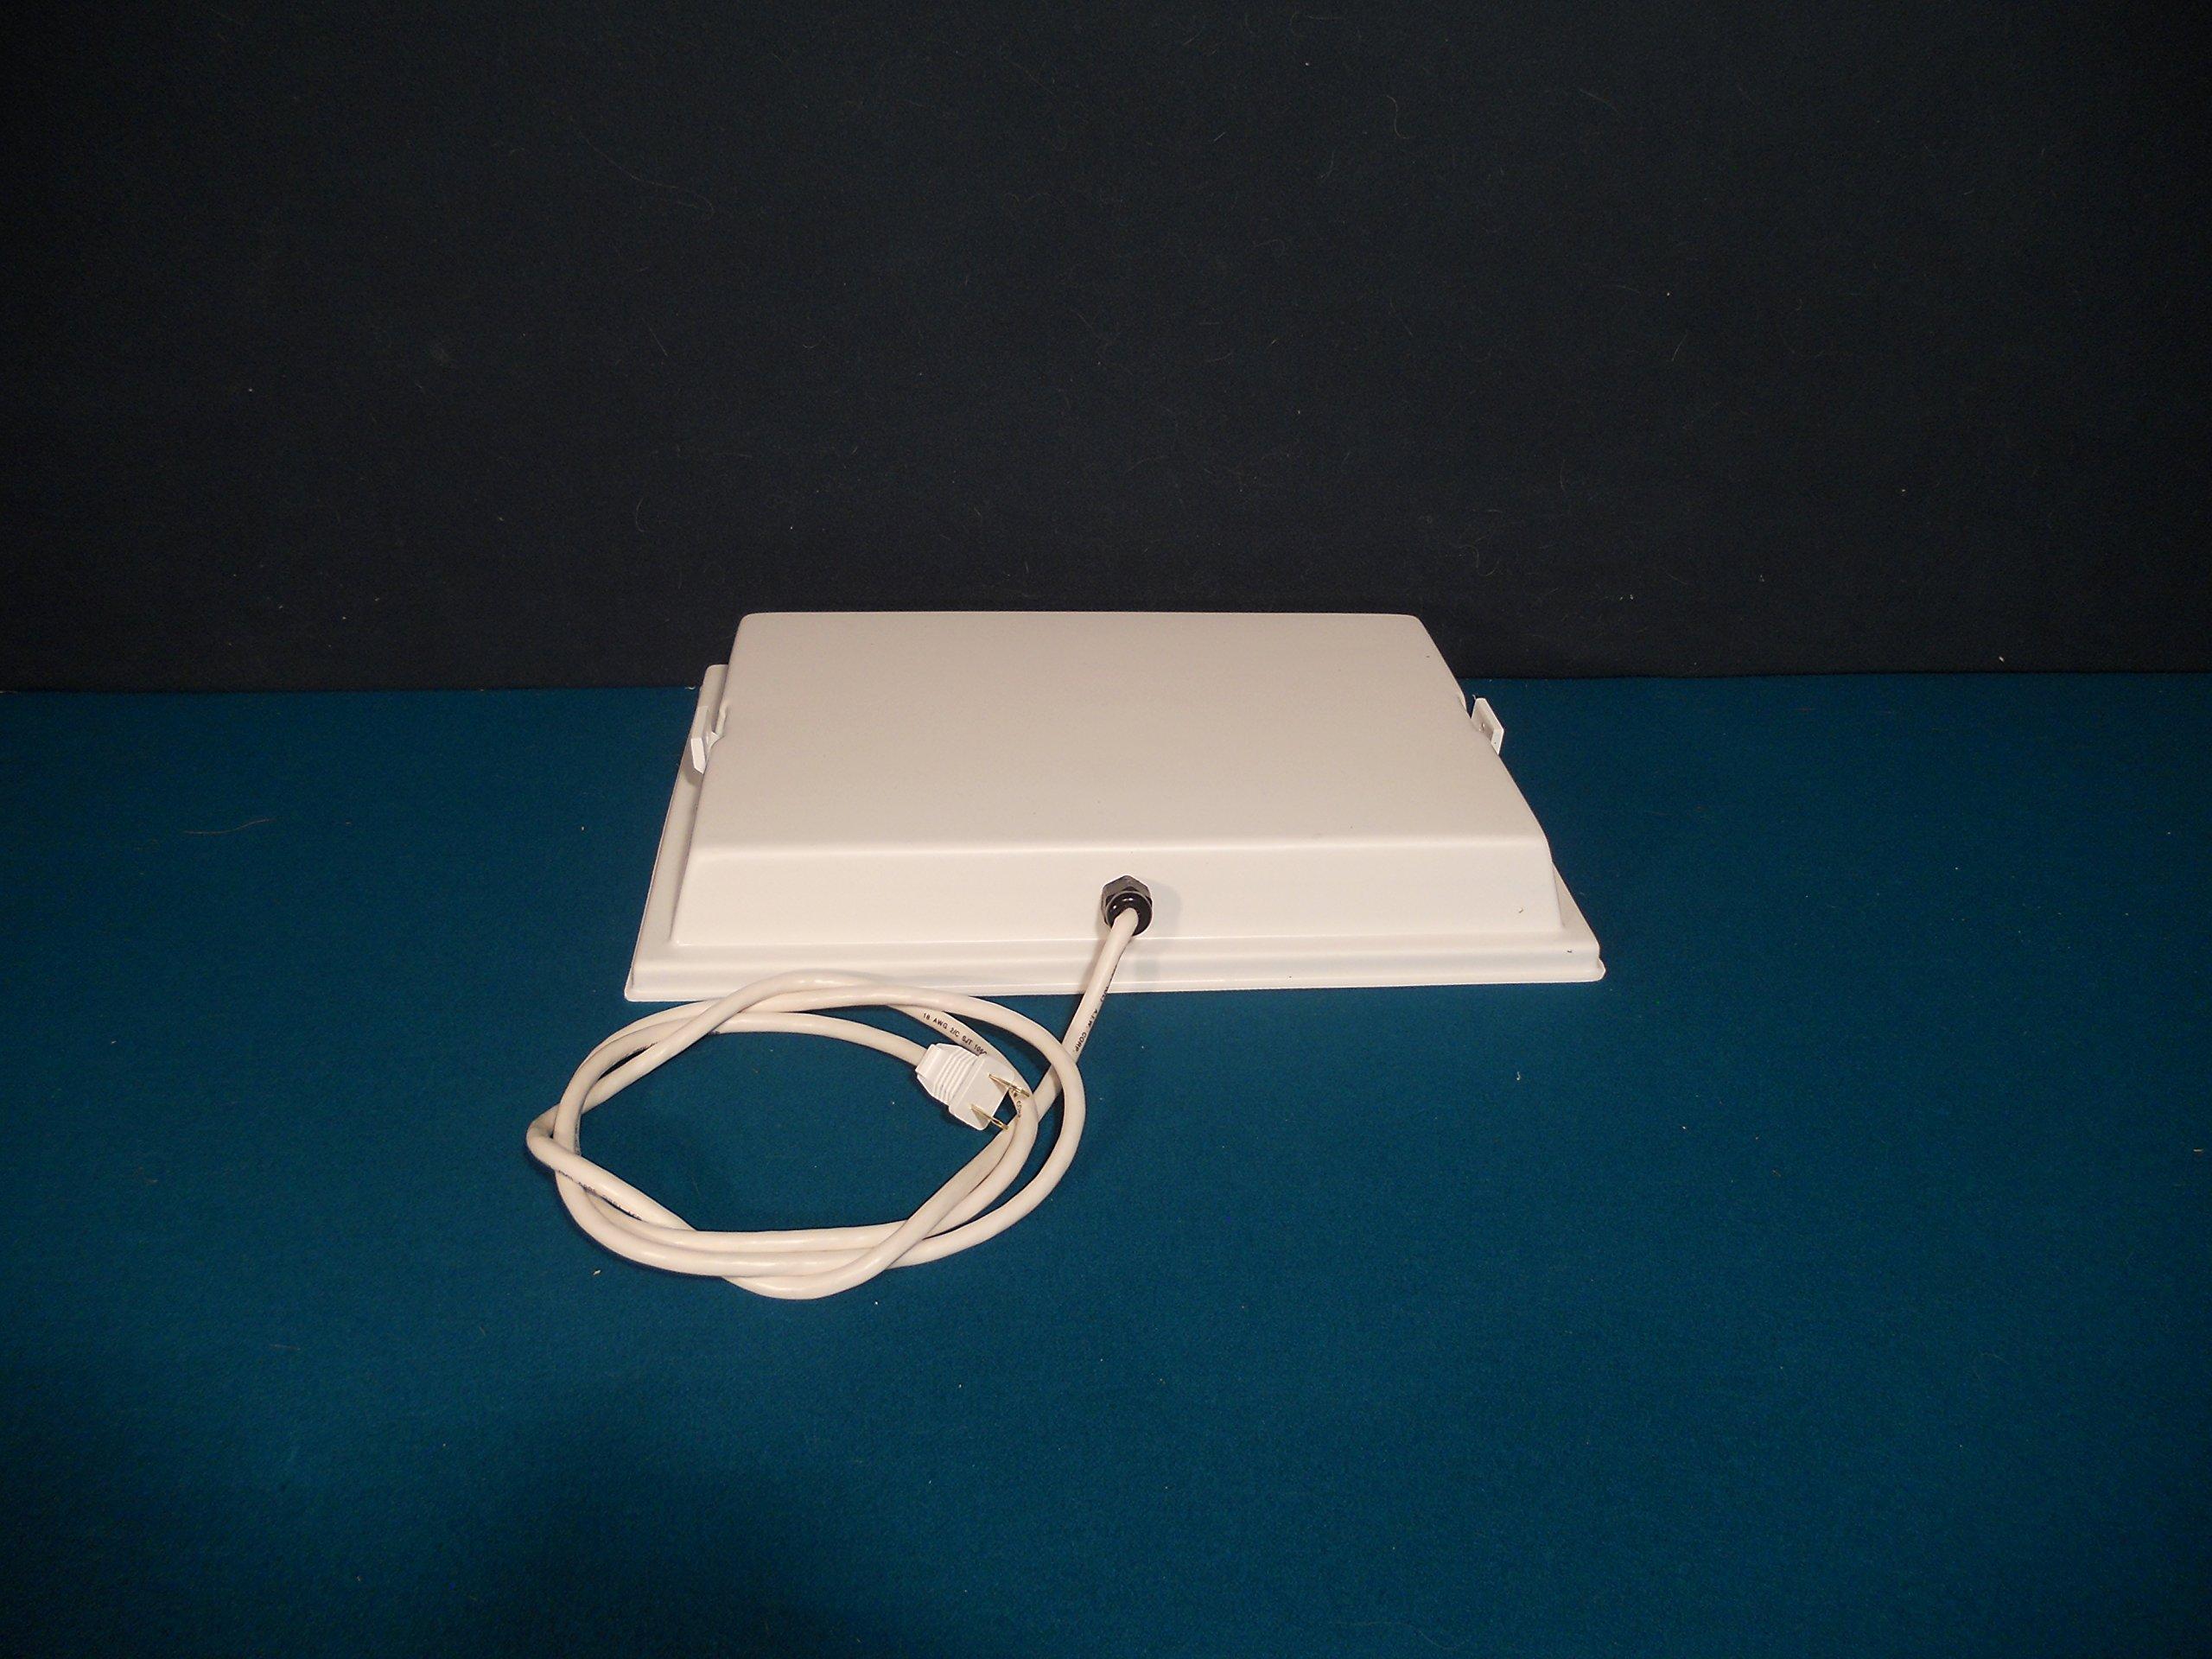 SWEETER HEATER Infrared Heater for Chicks & Pets, Side Mount 11x16, 50 Watt by SWEETER HEATER